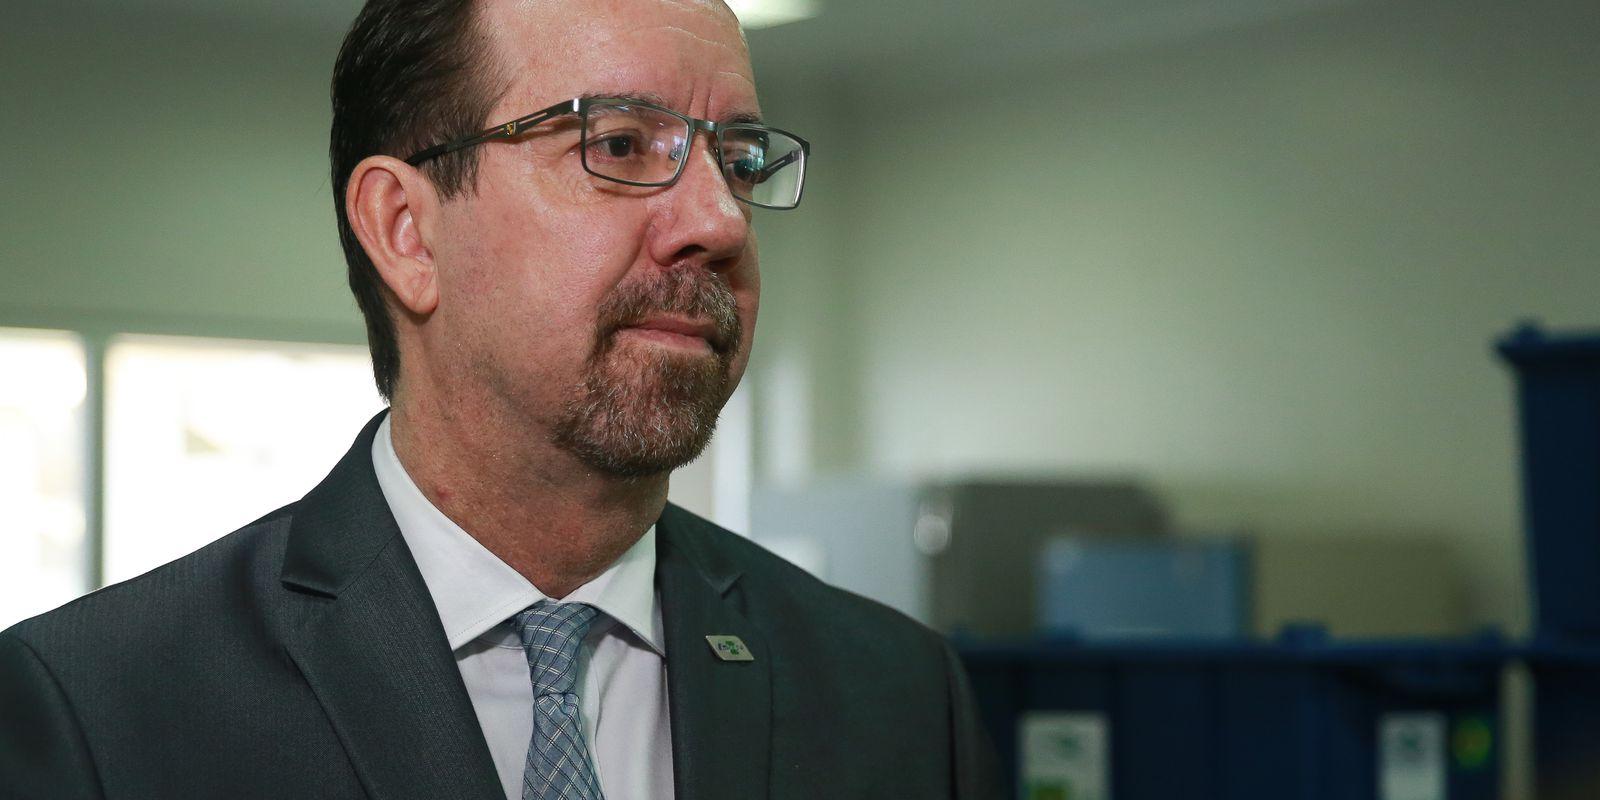 O presidente da Embrapa Celso Luiz Moretti fala à imprensa